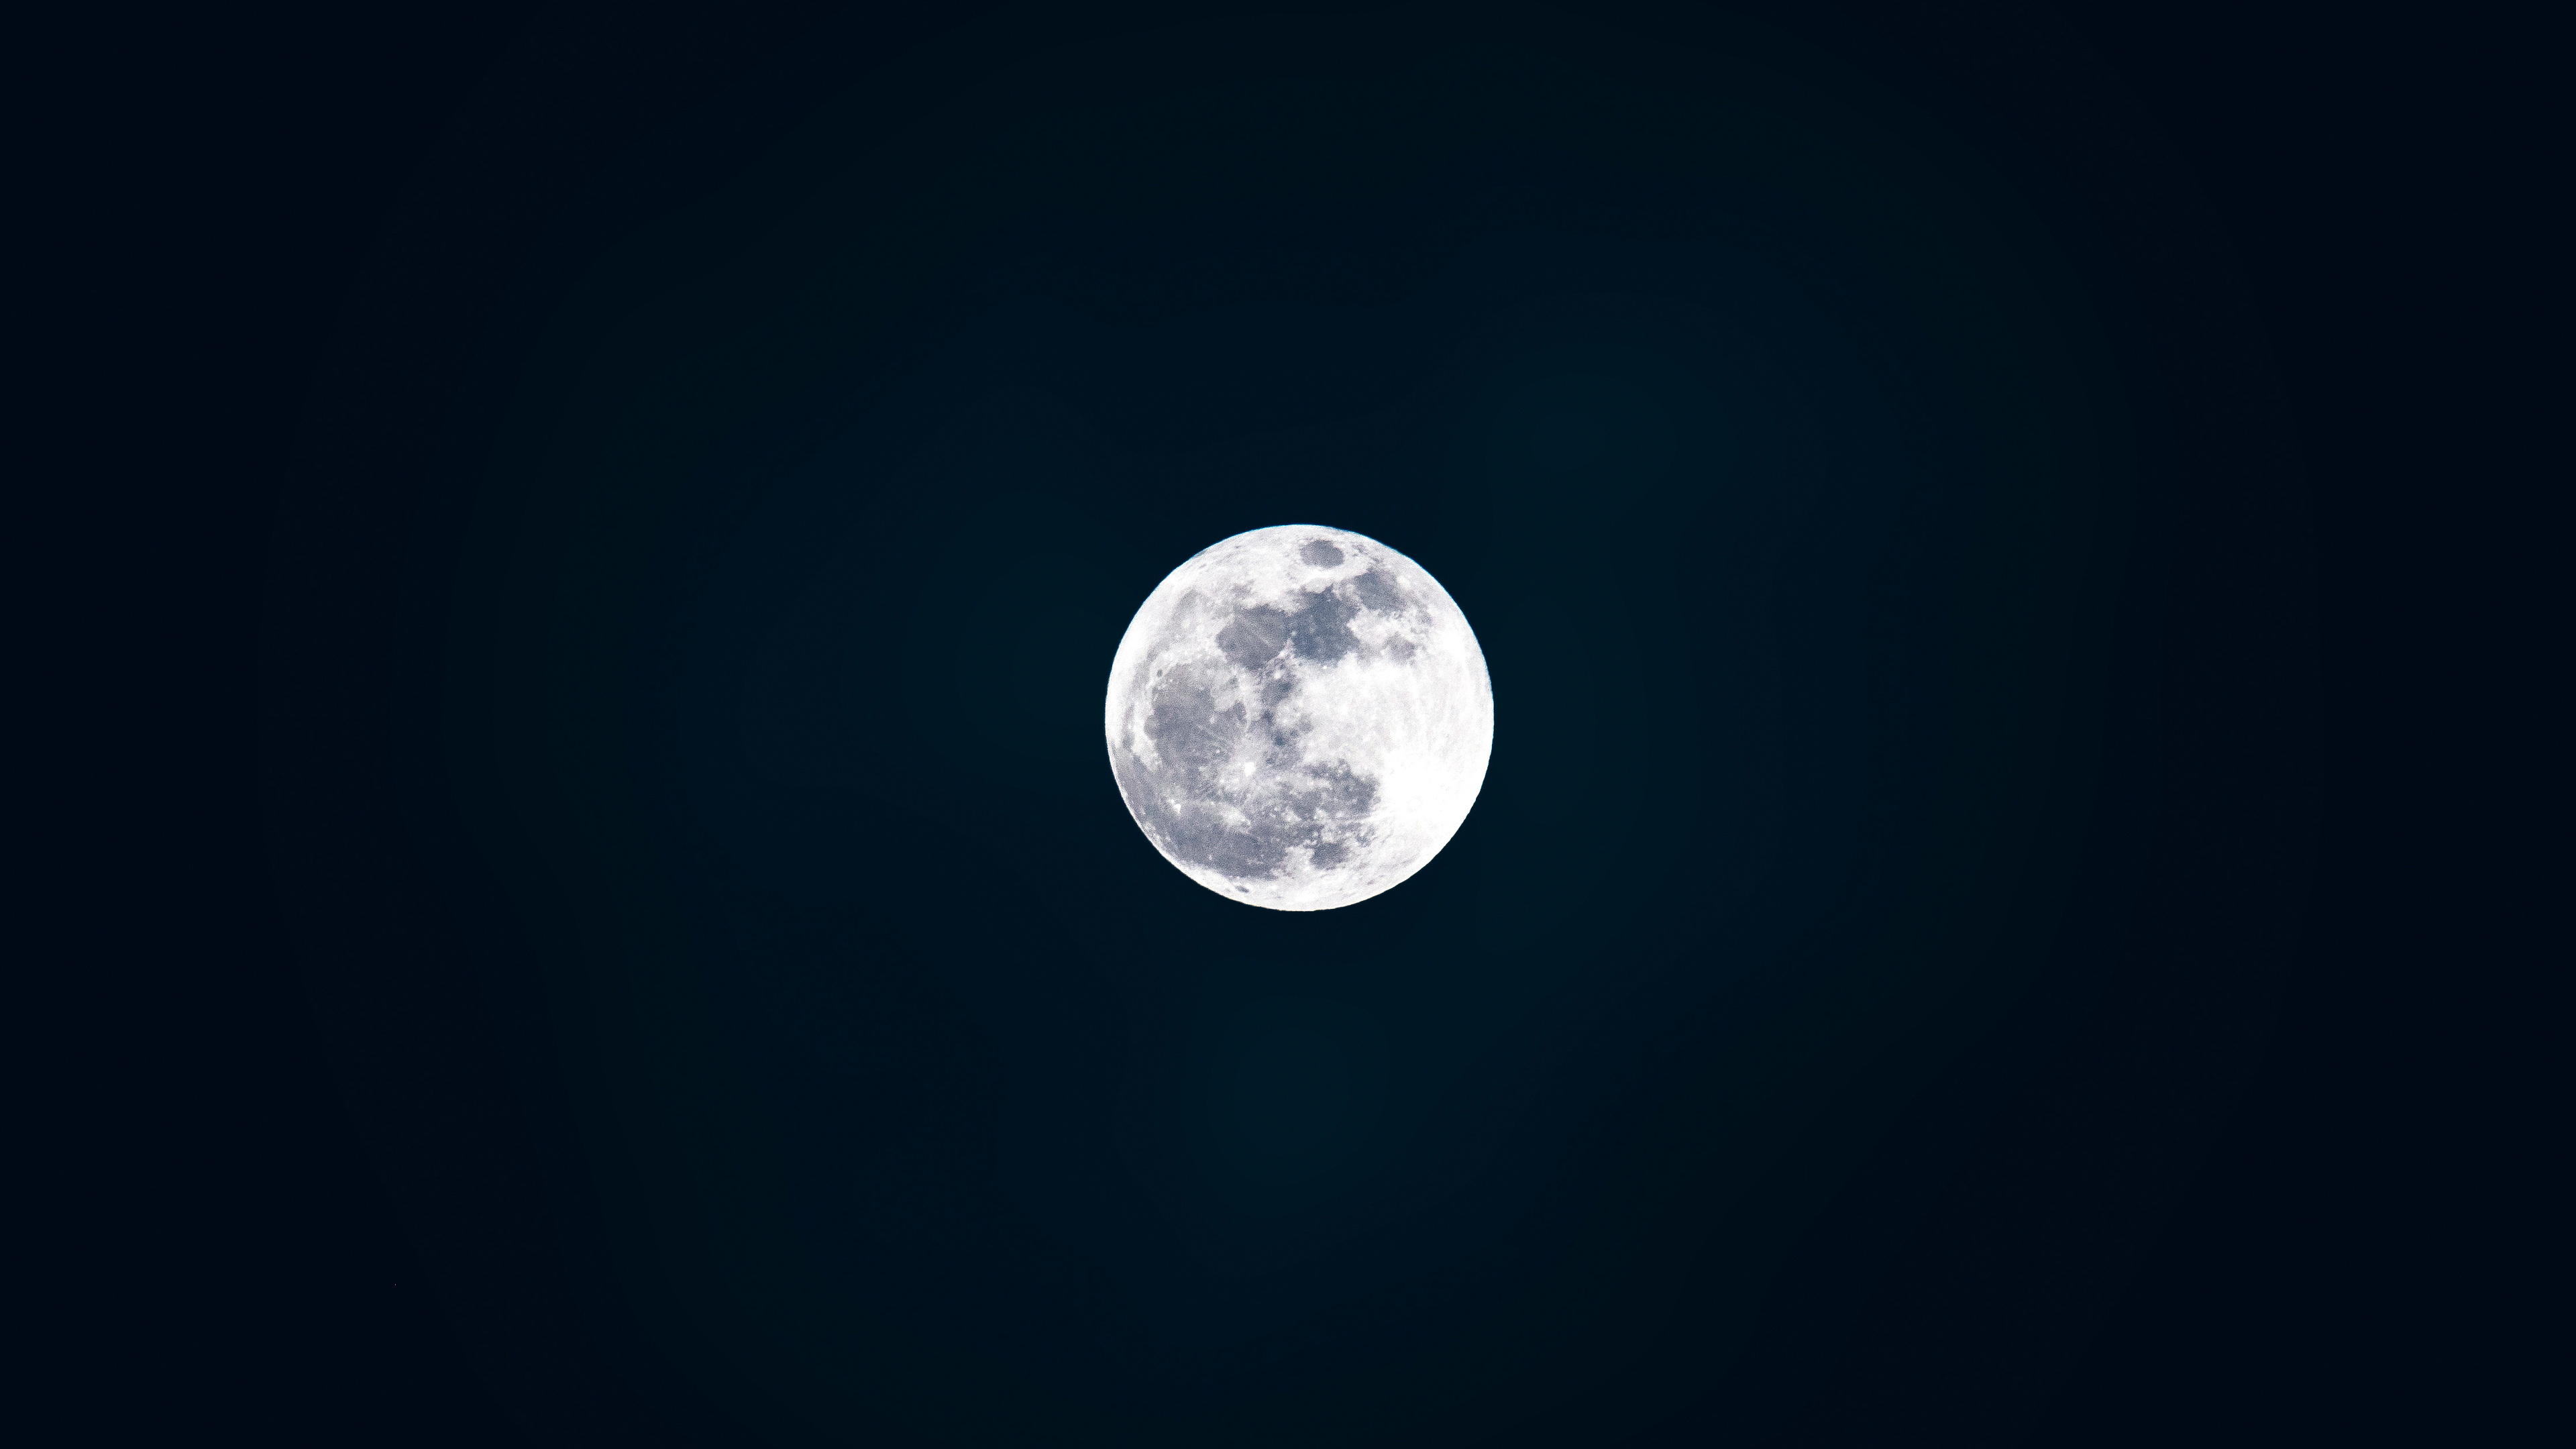 full moon 4k 1540135858 - Full Moon 4k - nature wallpapers, moon wallpapers, hd-wallpapers, 4k-wallpapers